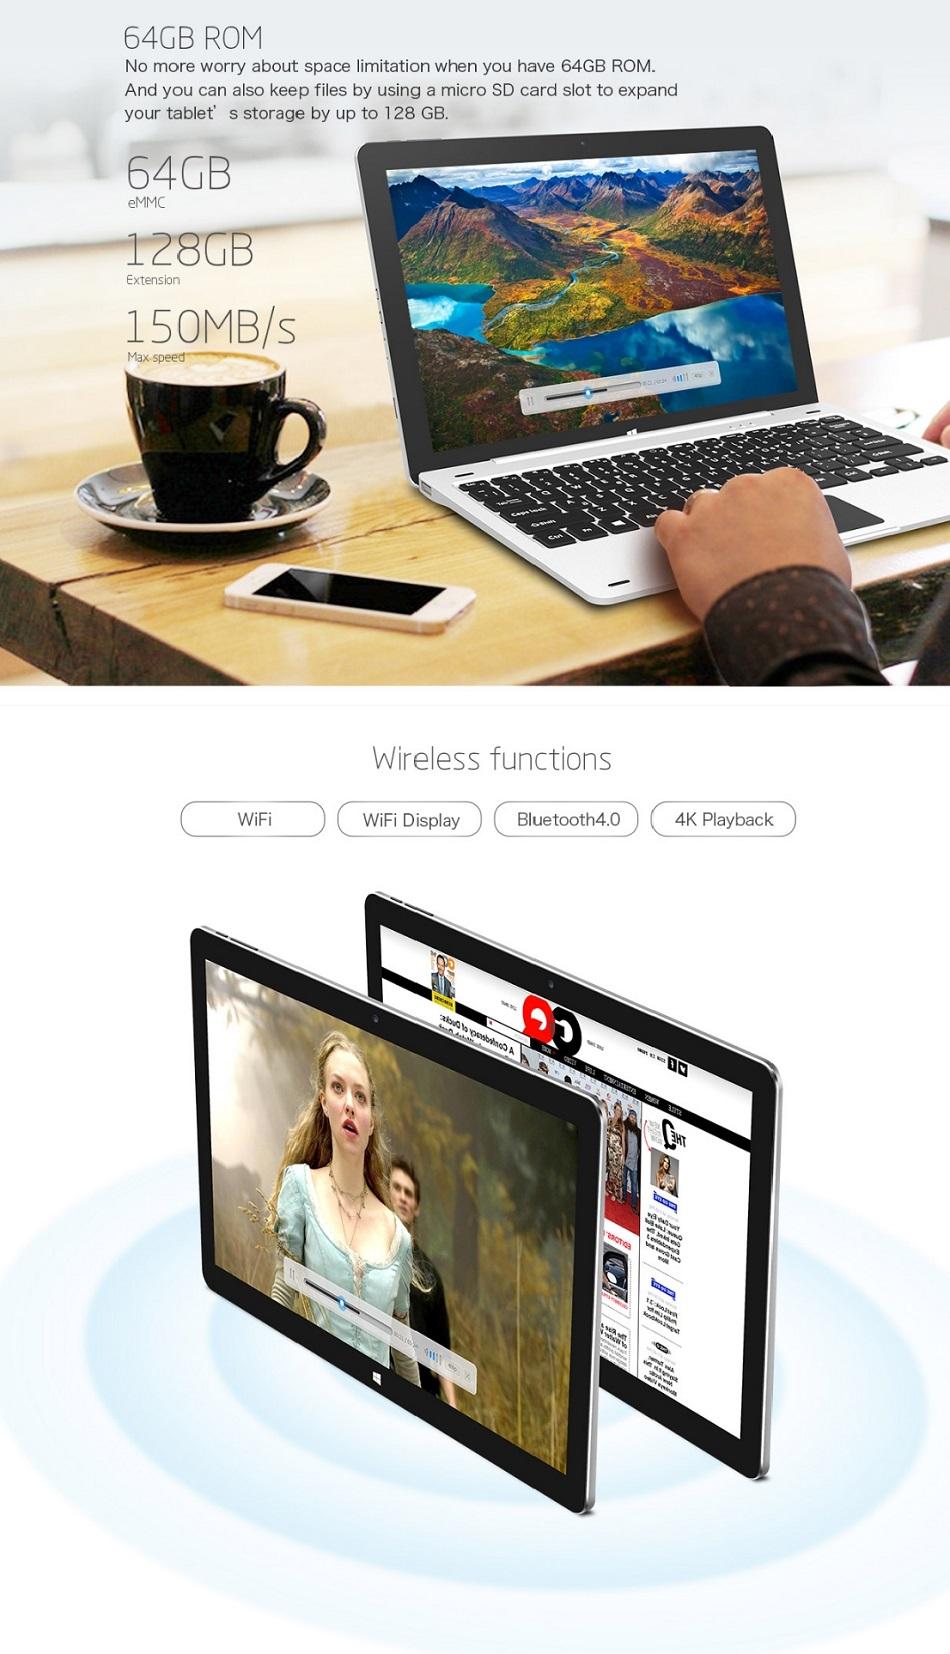 Teclast Tbook 12 Pro 64GB Intel Cherry Trail X5 Z8300 12.2 Inch Dual Boot Tablet